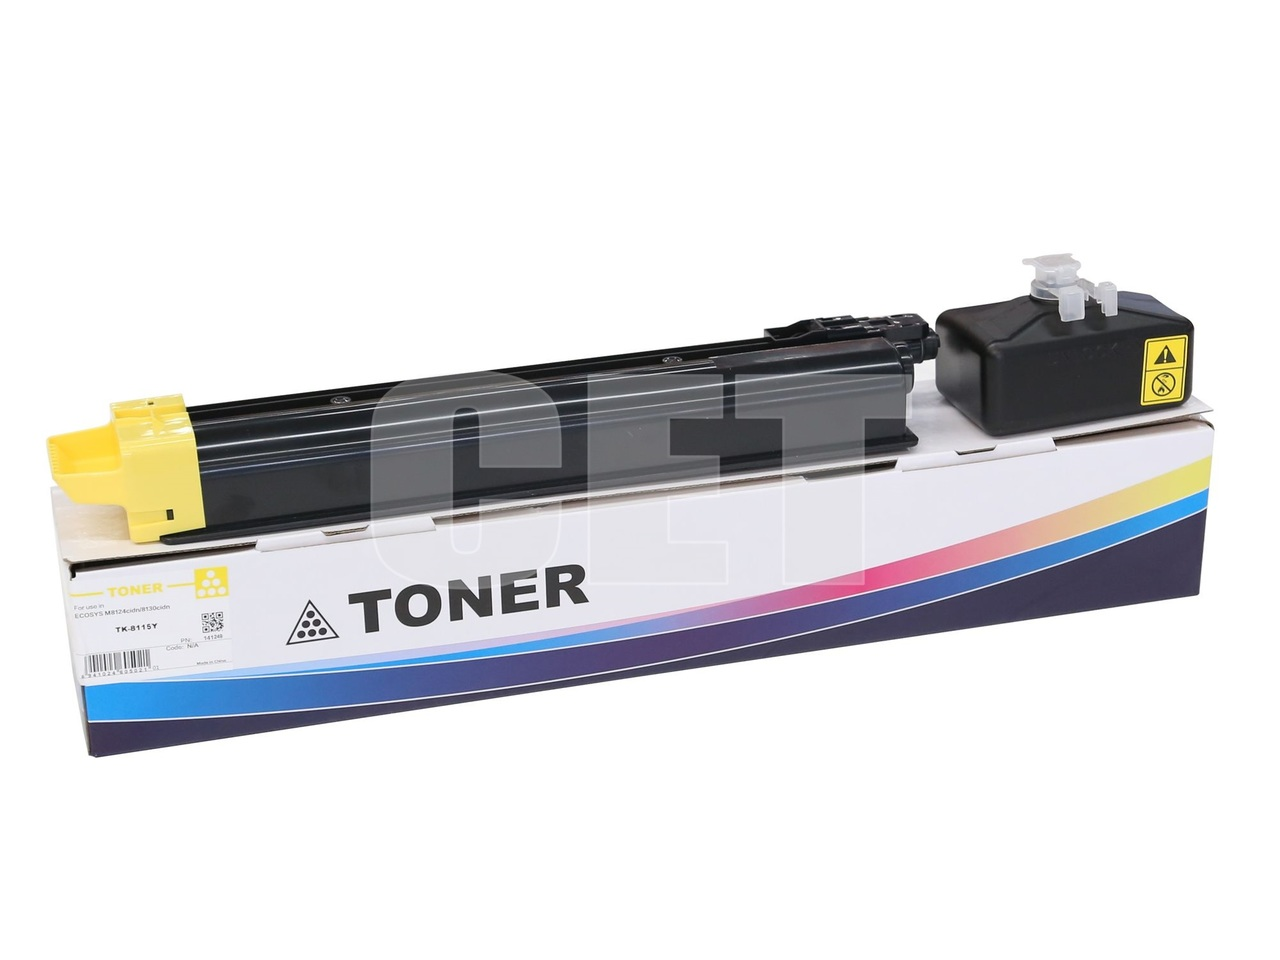 Тонер-картридж (PK207) TK-8115Y для KYOCERA ECOSYSM8124cidn/8130cidn (CET) Yellow, 105г, 6000 стр., CET141249